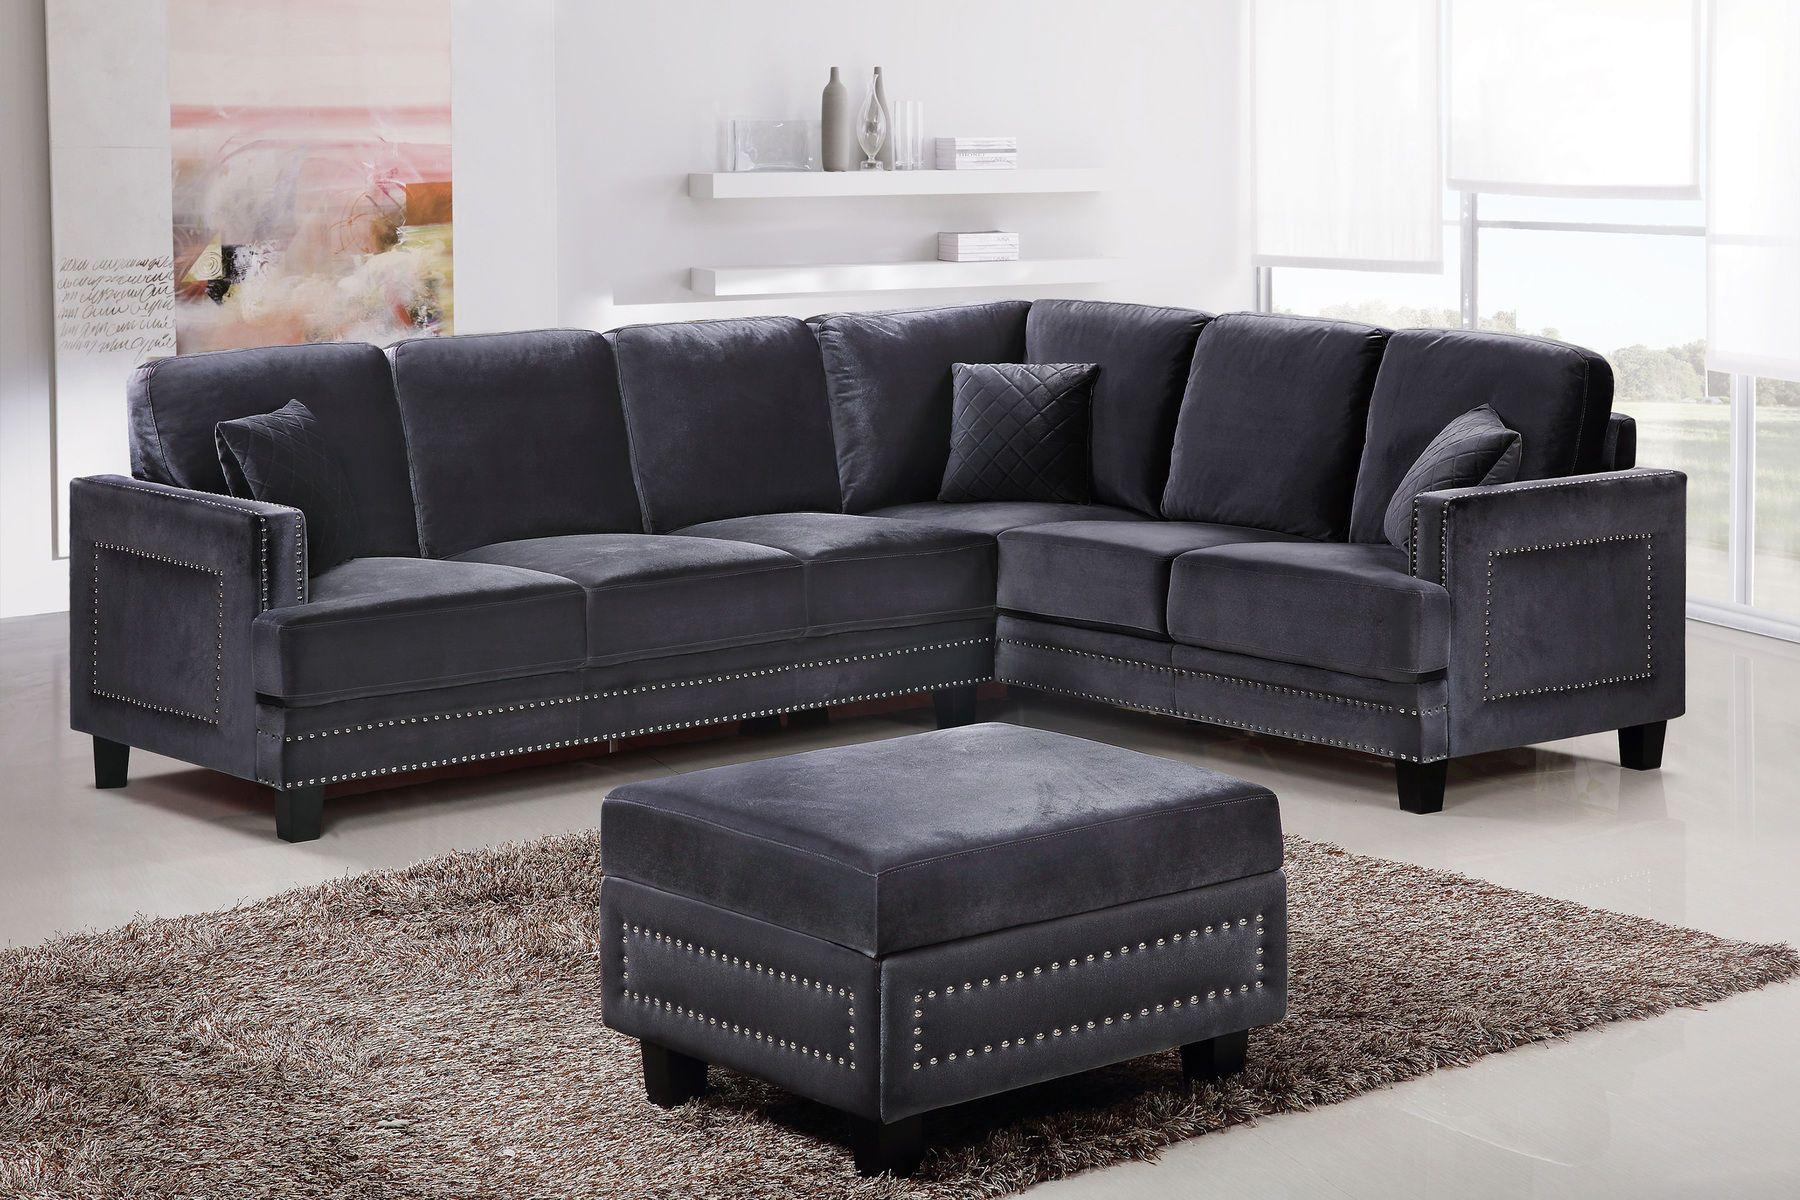 Ferrara Gray Sectional Sofa Modern Sofa Sectional Contemporary Sectional Sofa Sectional Sofa